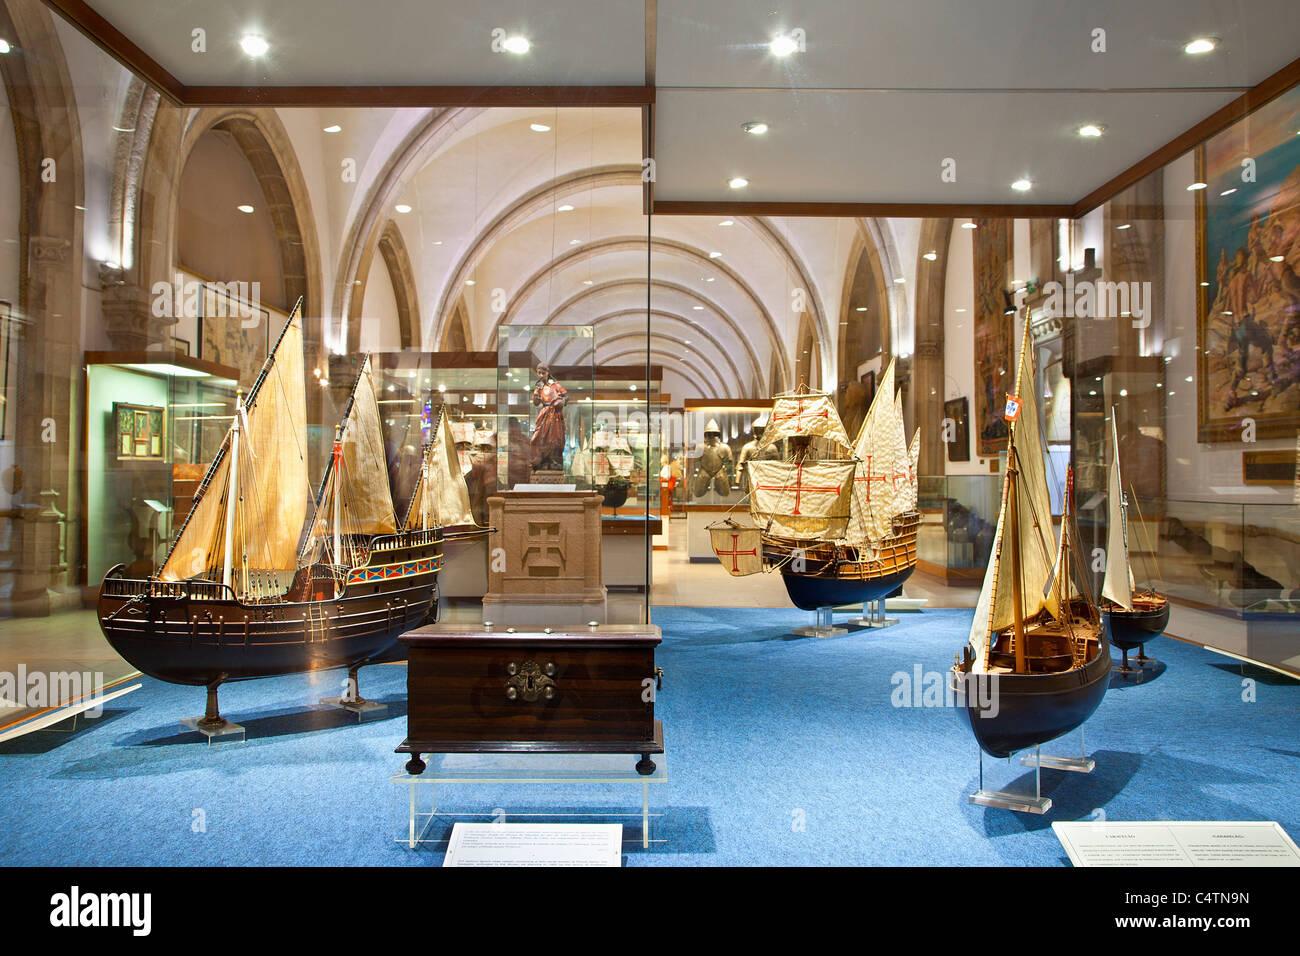 Europe, Portugal, Lisbon, Belem Maritime Museum - Stock Image